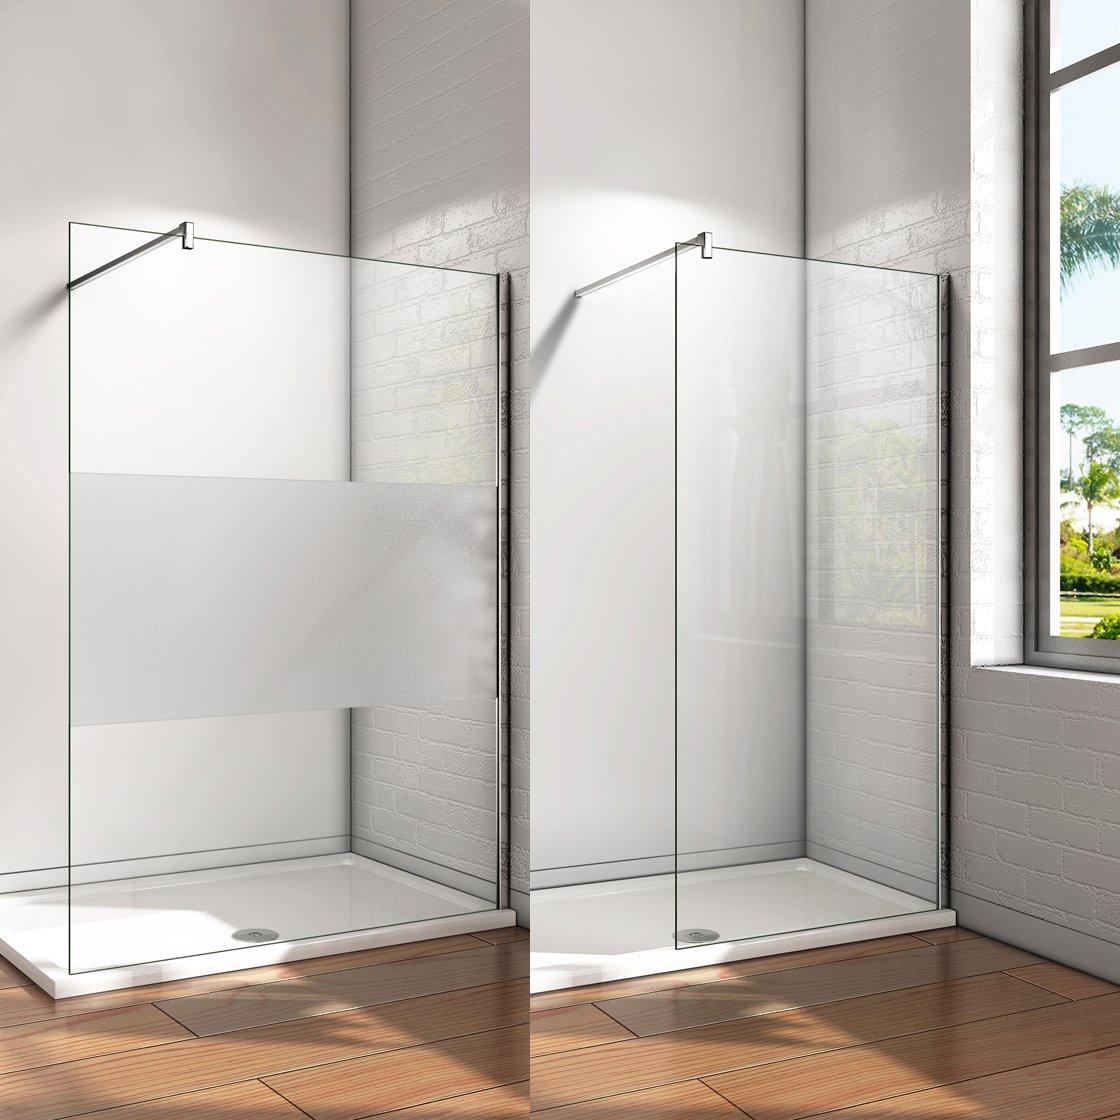 Mampara ducha Panel Pantalla Fija cristal 10mm templado para ba/ño Barra 140cm 130x200cm